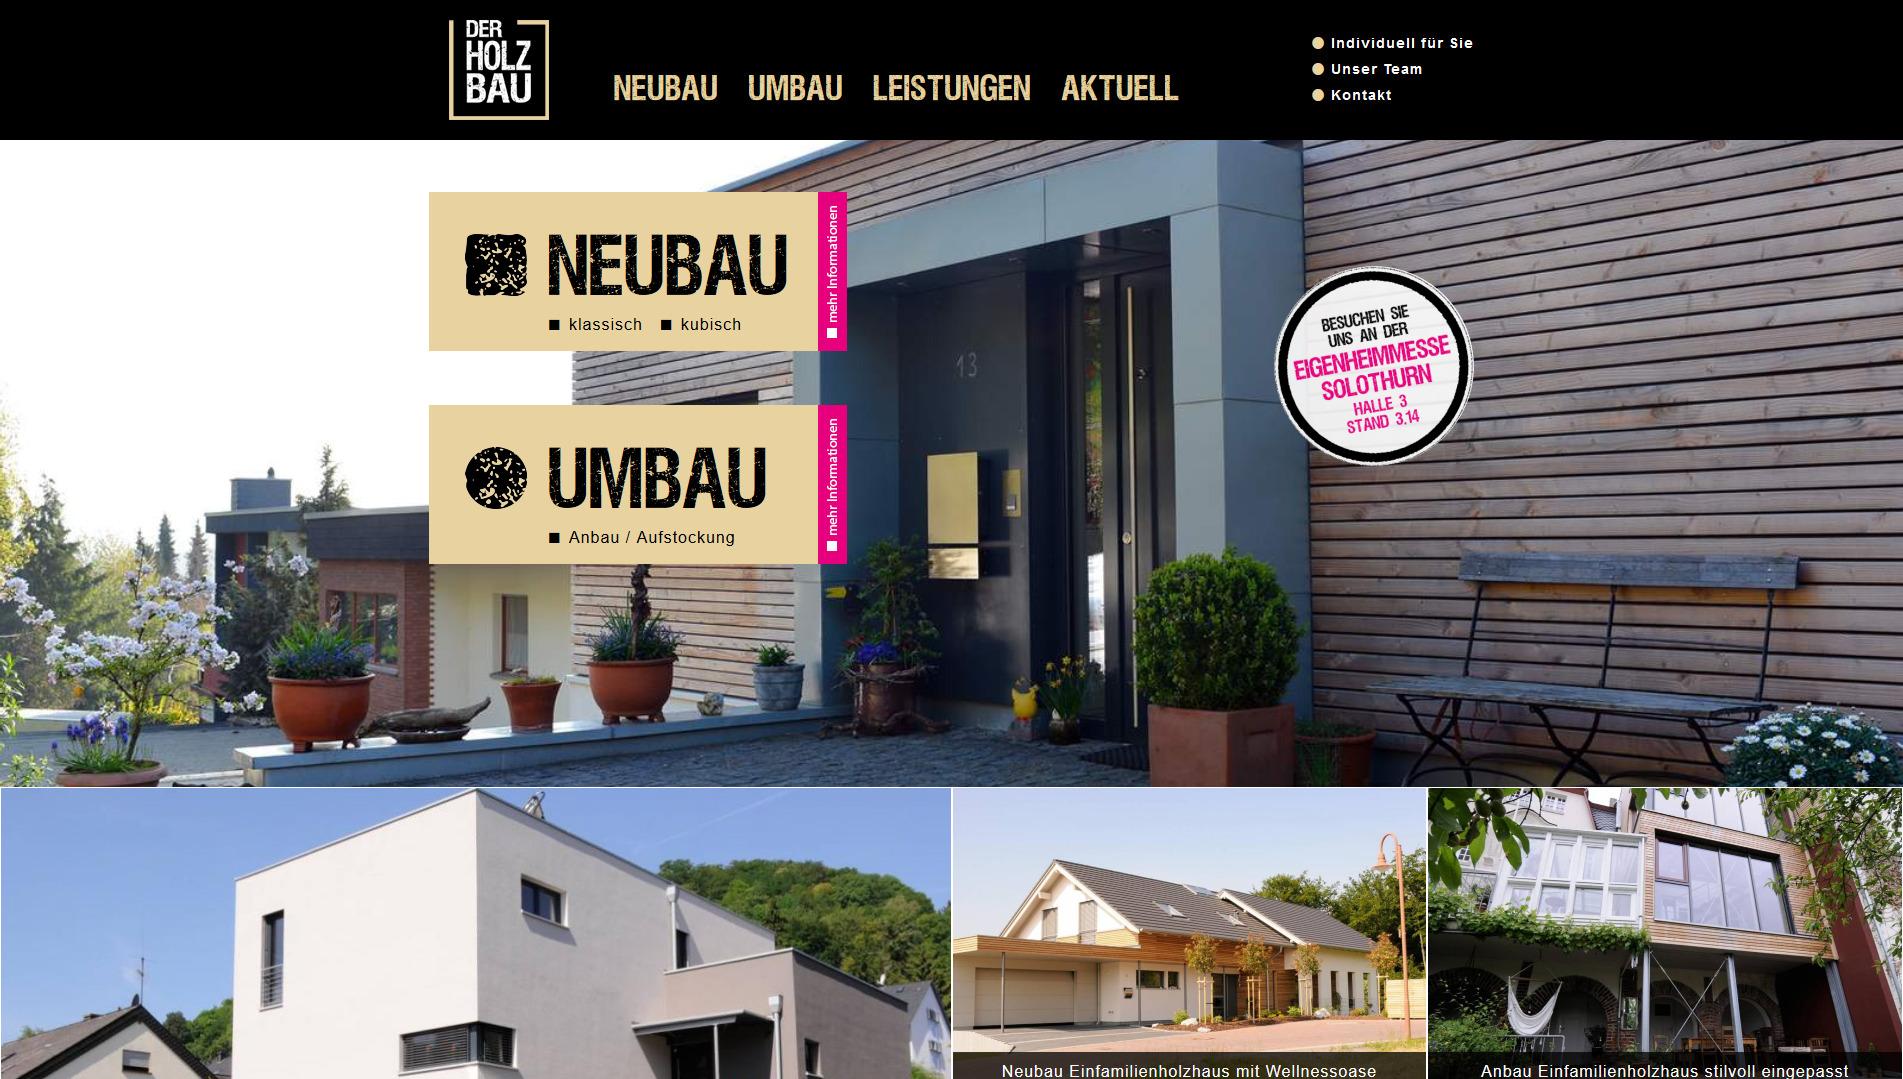 Kachel layout  Der Holzbau Hamburg › G-O-H.net